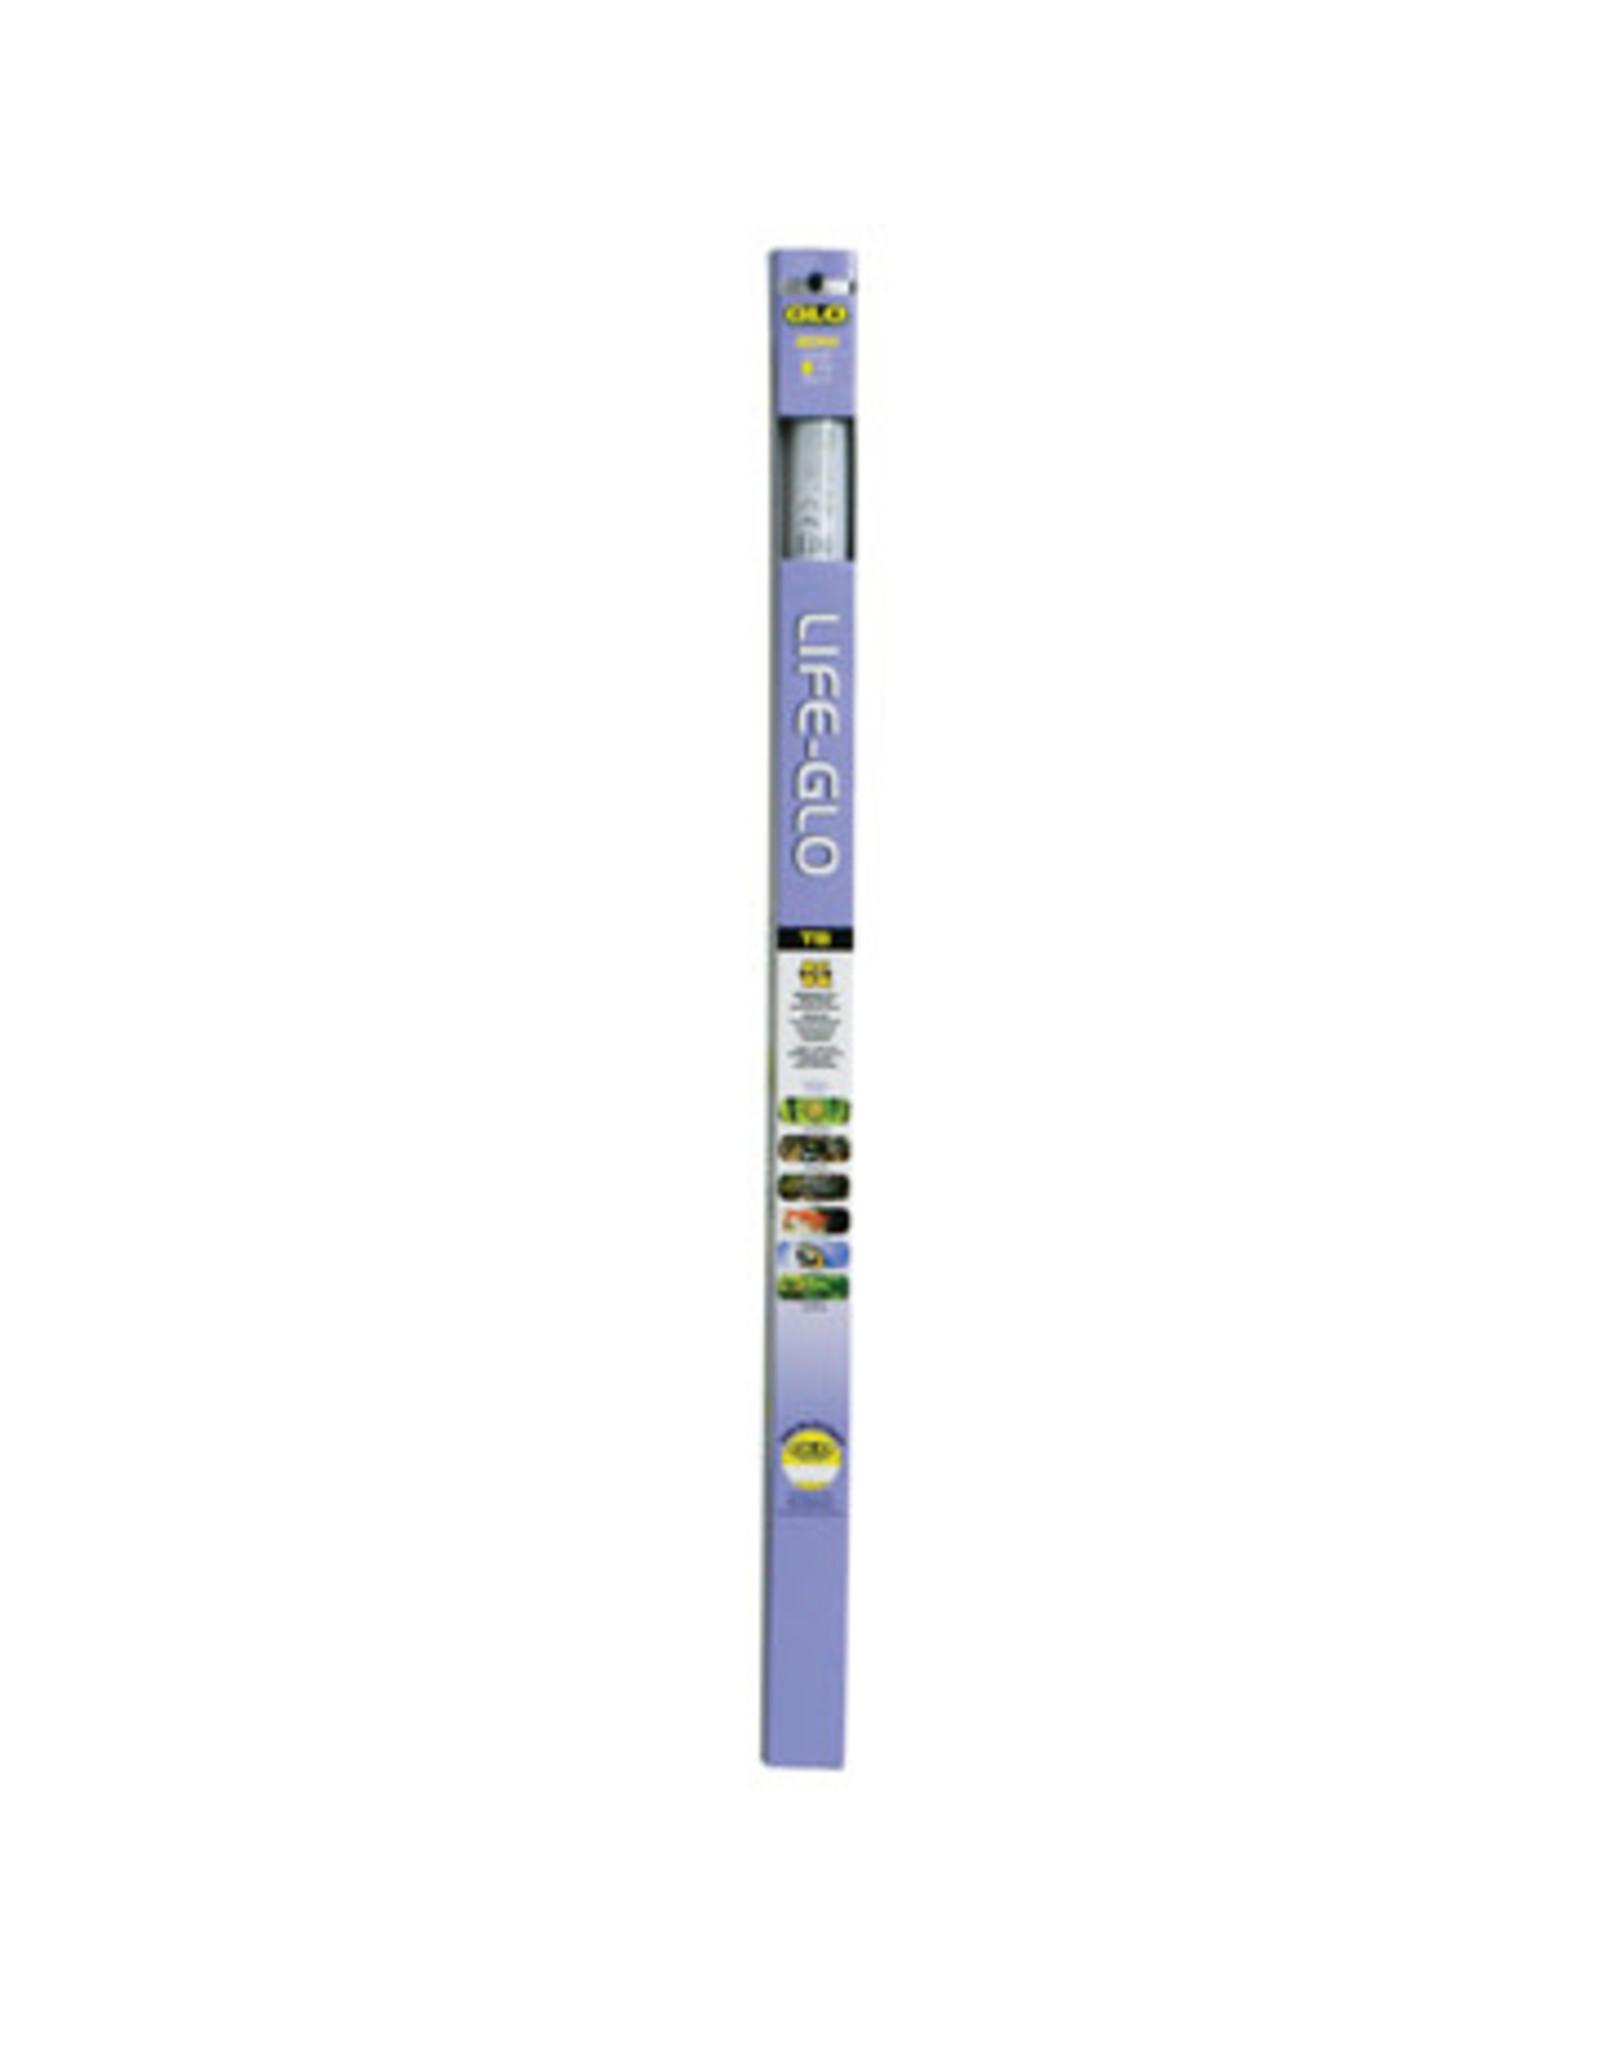 GLO Life-GLO T8 Fluorescent Aquarium Bulb, 20 W, 61 cm x 2.5 cm (24 in x 1 in)